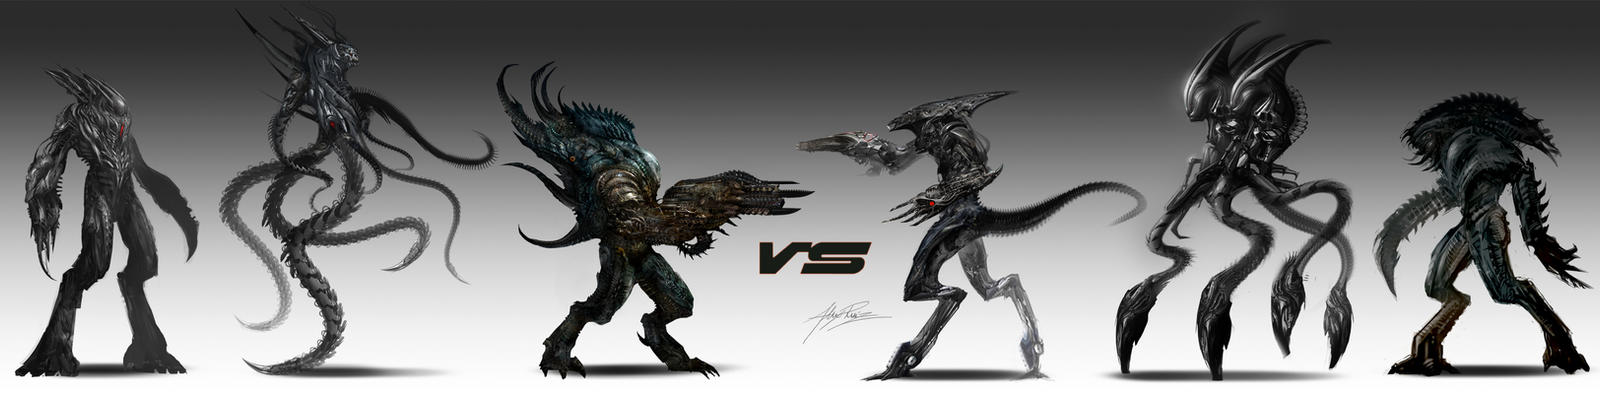 RoboMech Deathmatch by AlexRuizArt